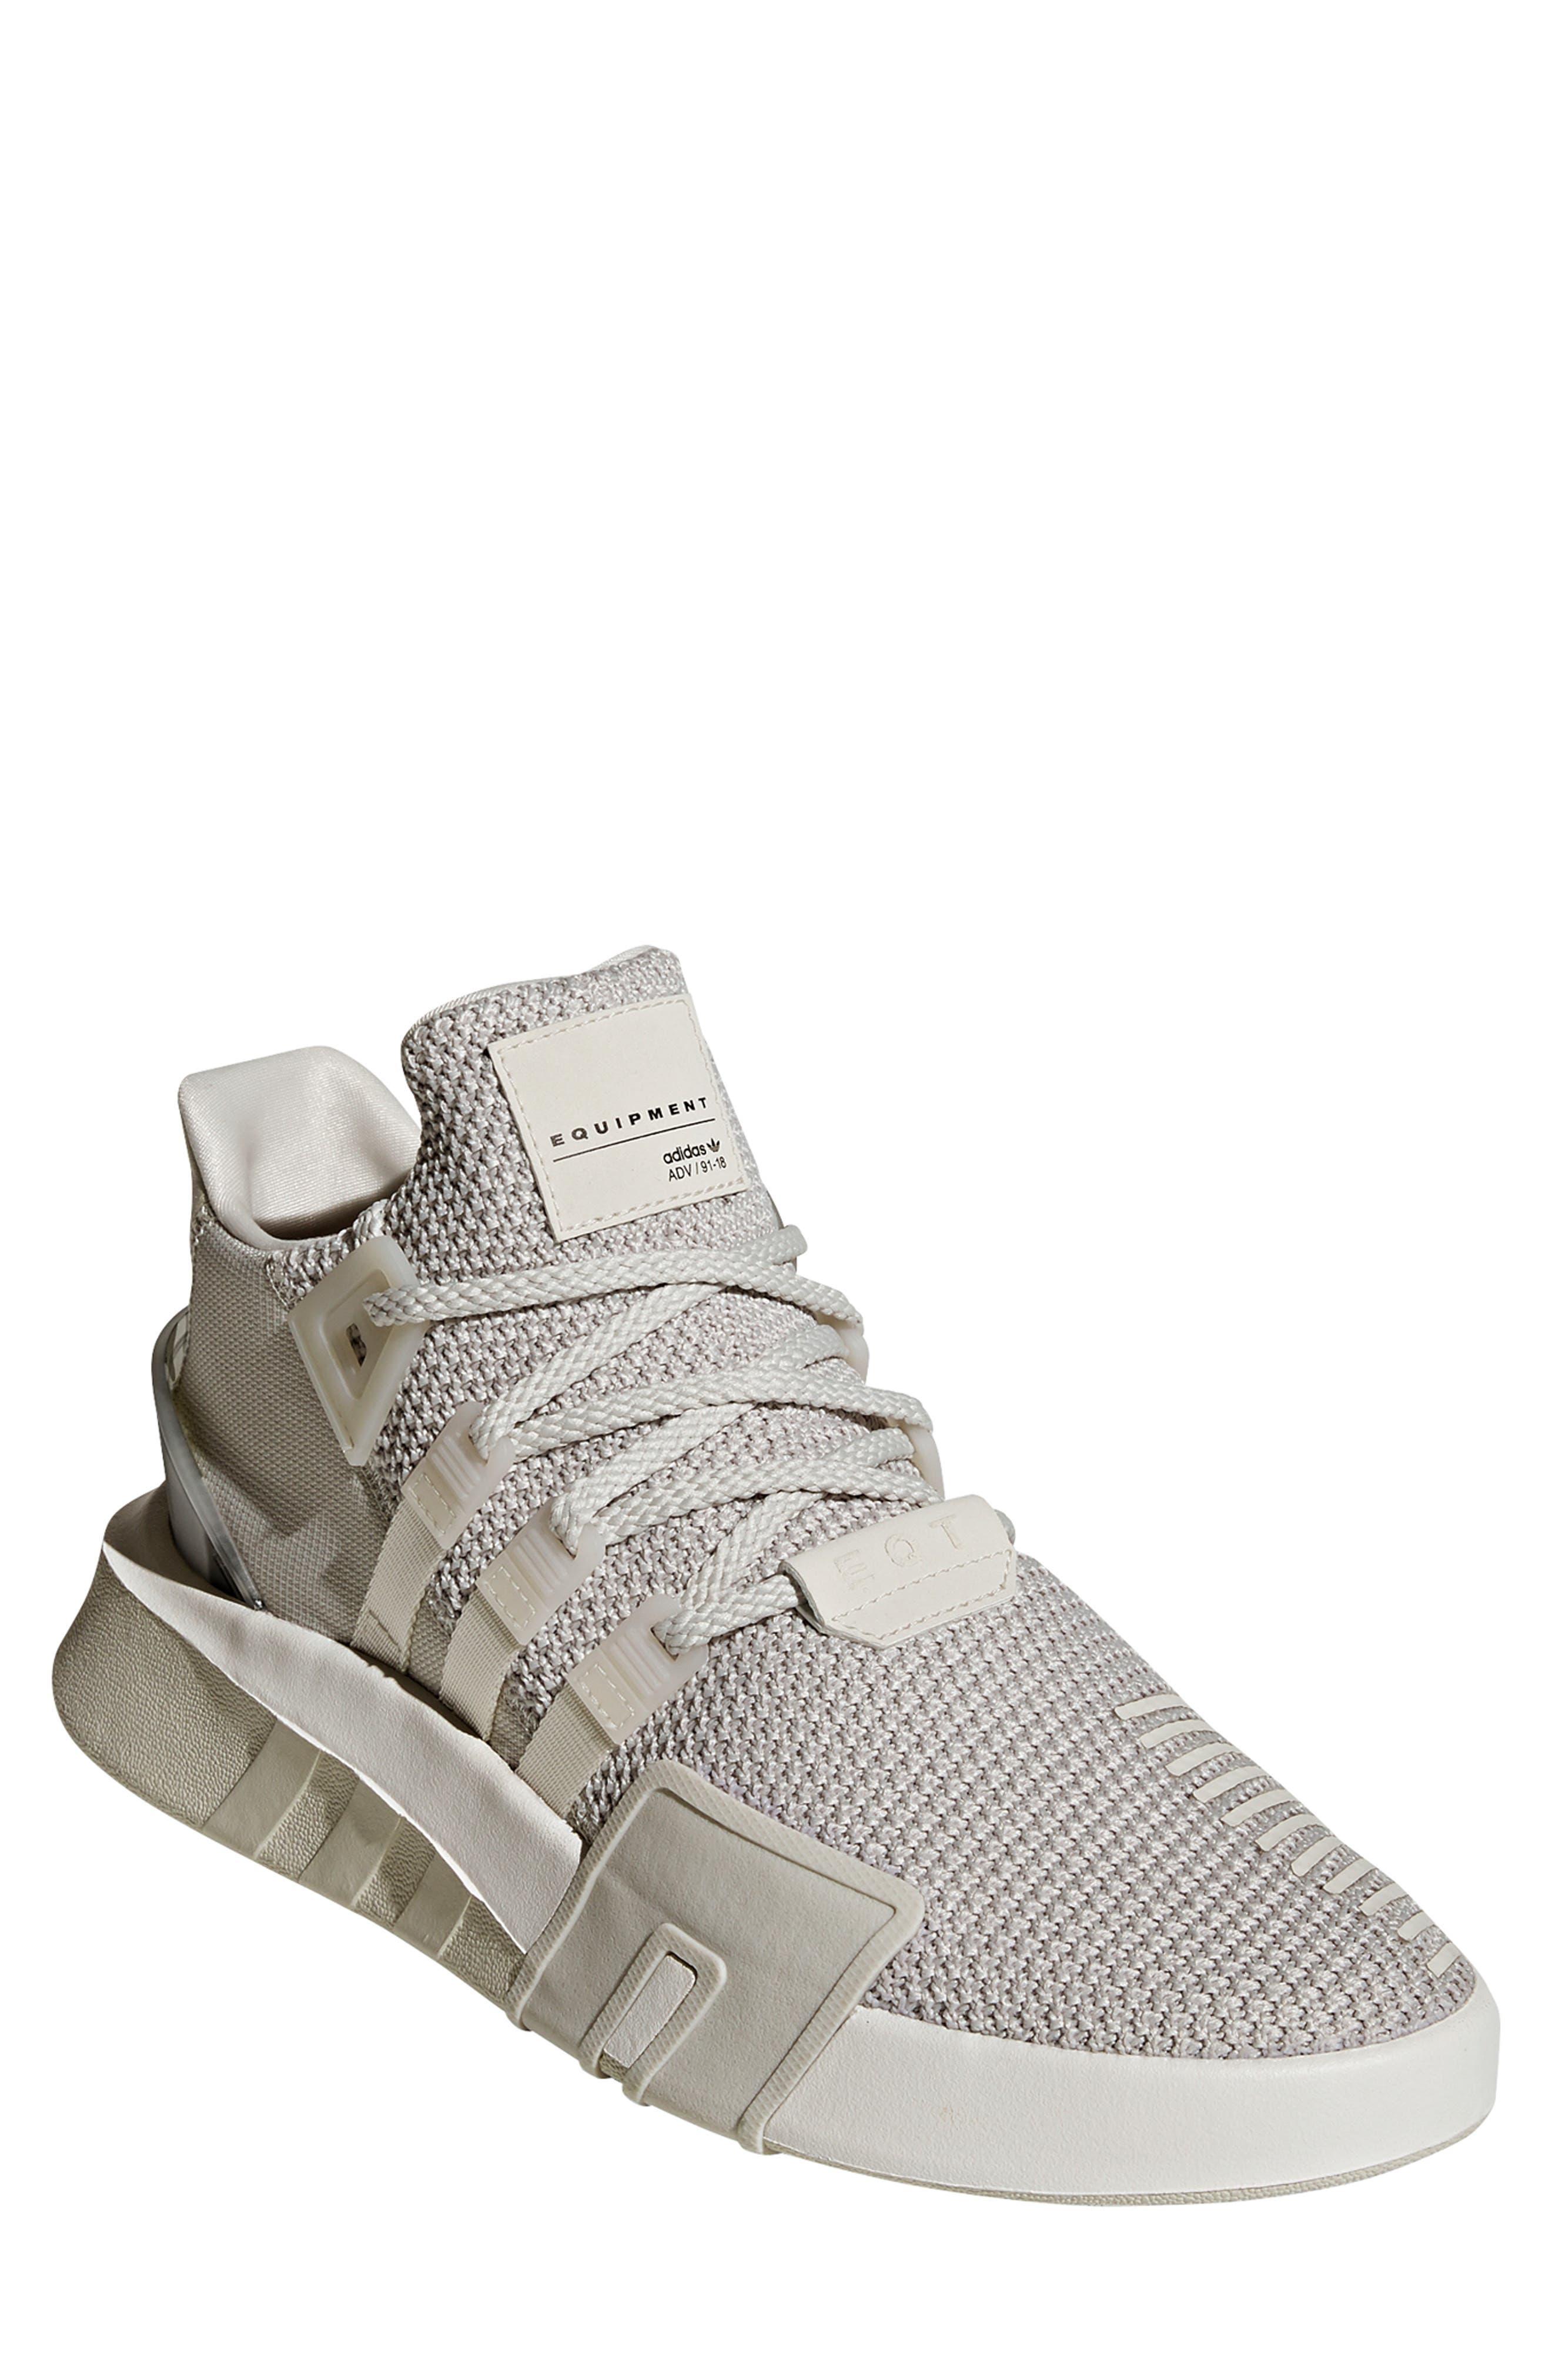 EQT Basketball ADV Sneaker,                         Main,                         color, GREY/ CHALK WHITE